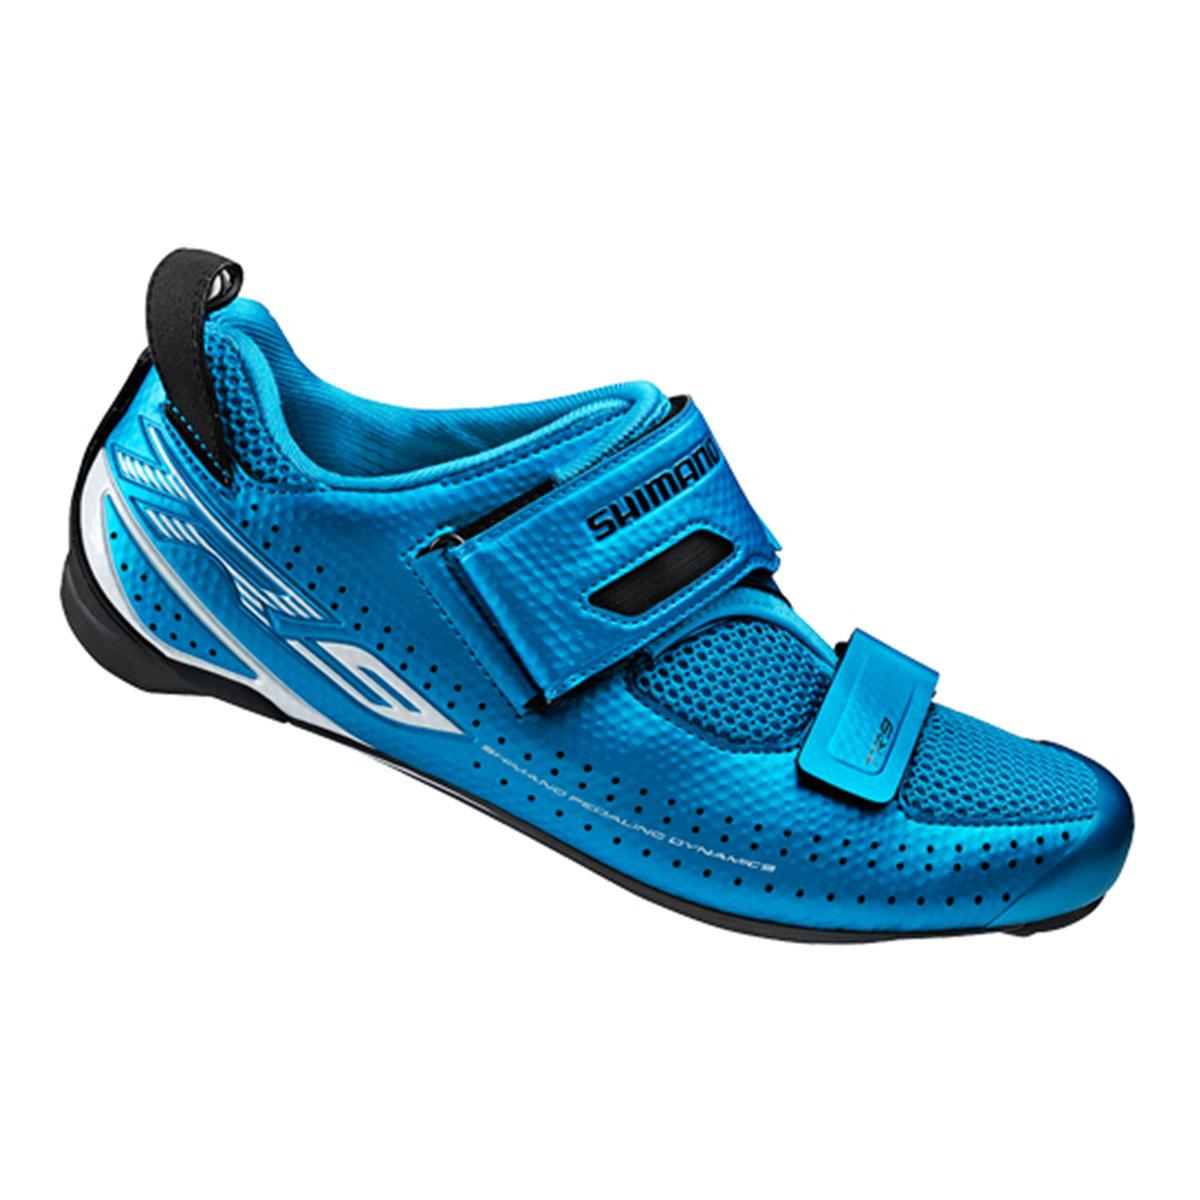 ESHTR9NC420SB00 Shimano (TR9) Triathlon Shoe